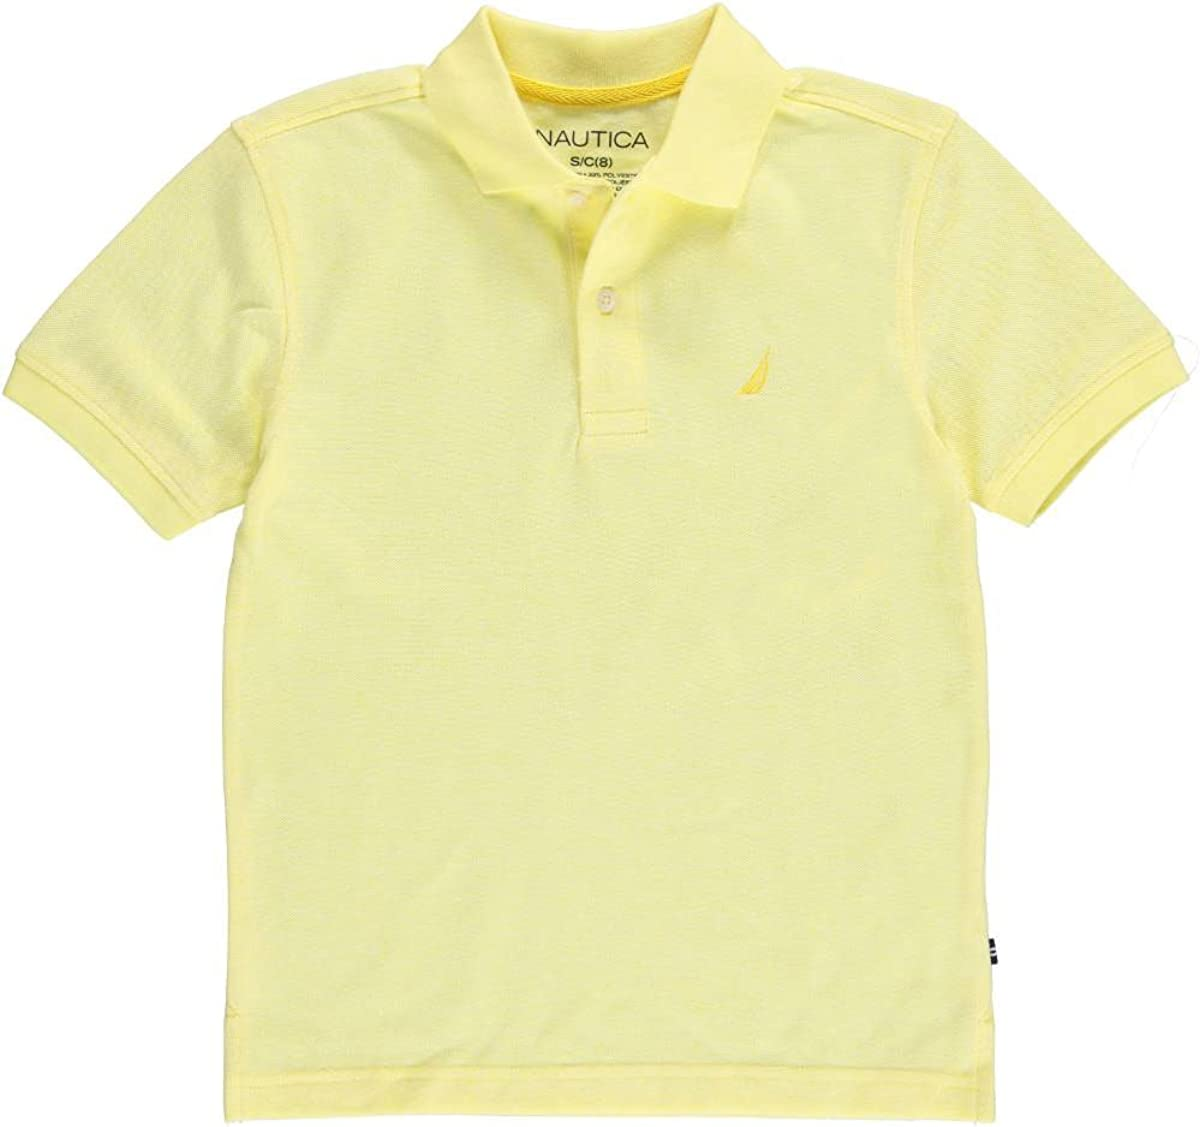 Nautica Boys' Short Sleeve Colorblock Deck Shirt